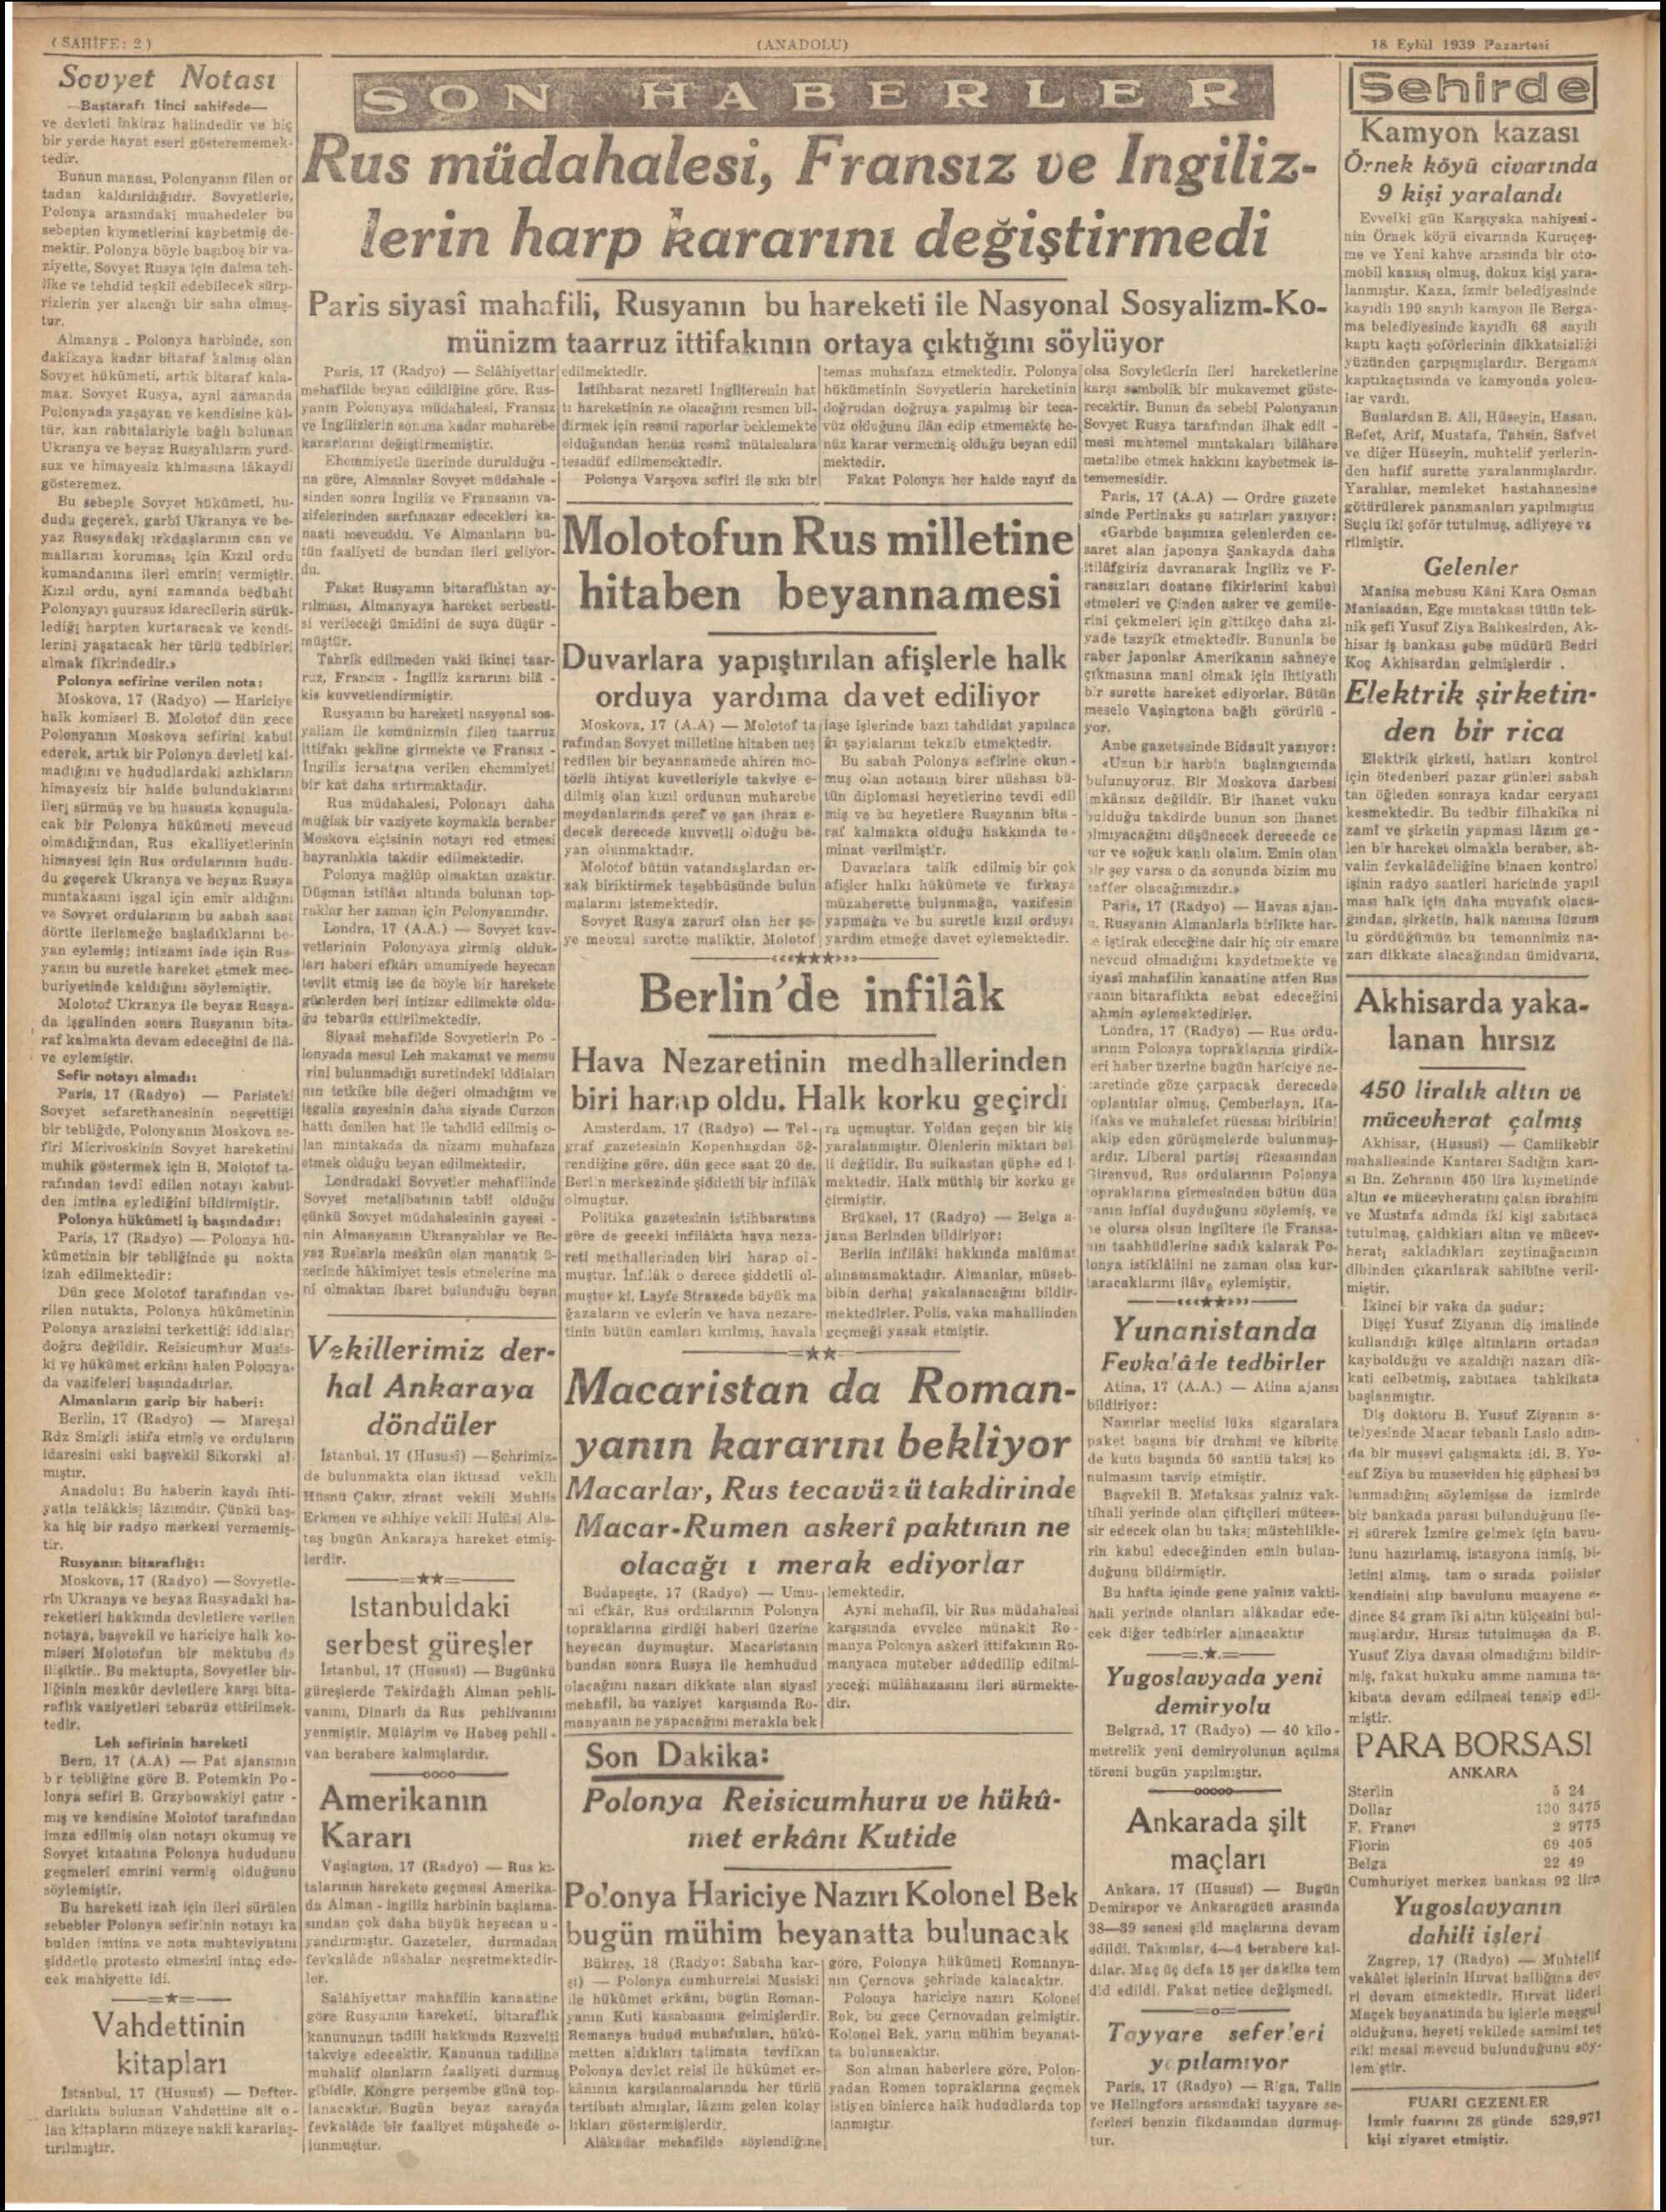 18 Eylül 1939 Tarihli Anadolu Dergisi Sayfa 2